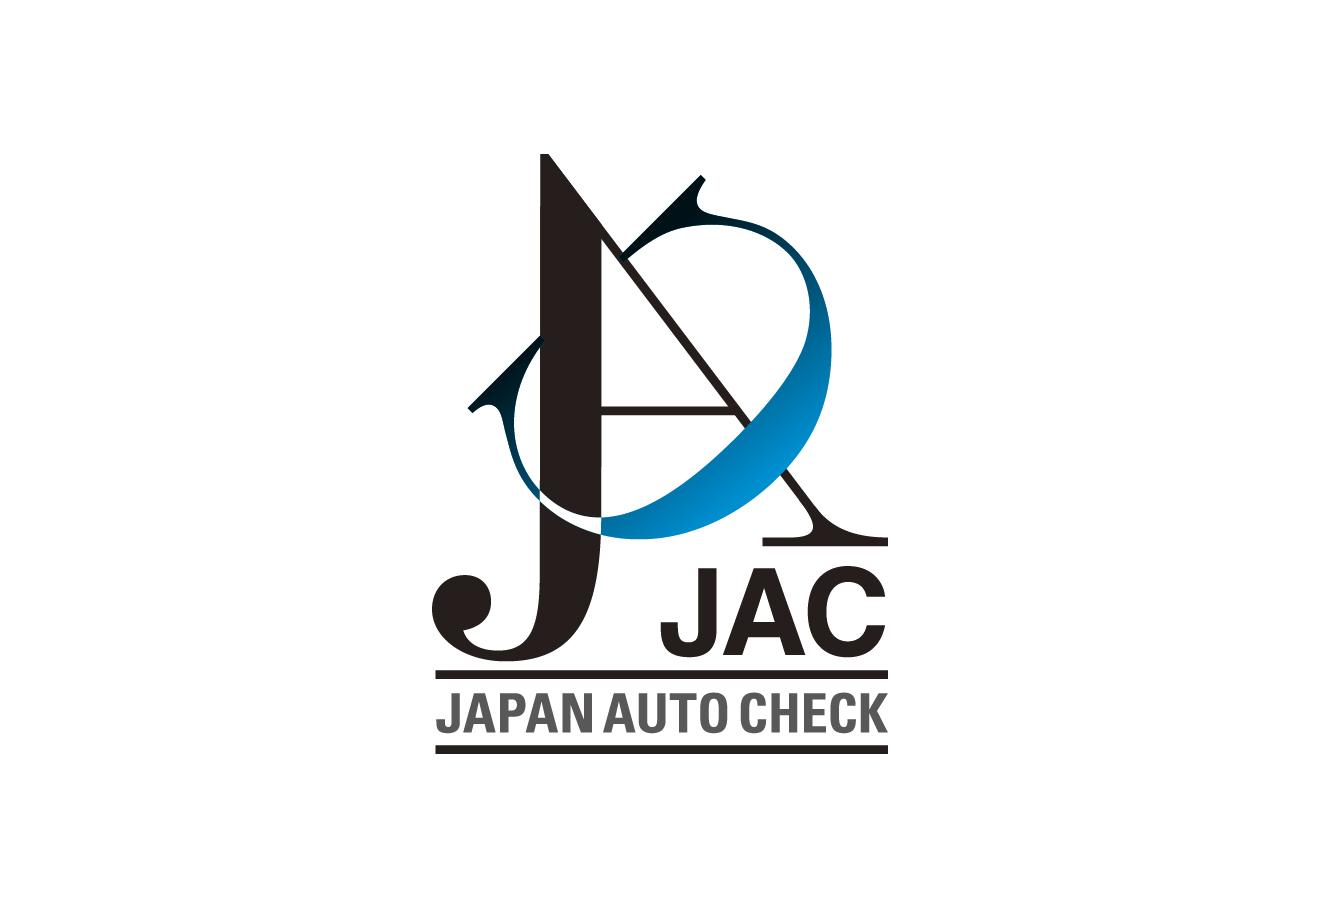 Japan Auto Check